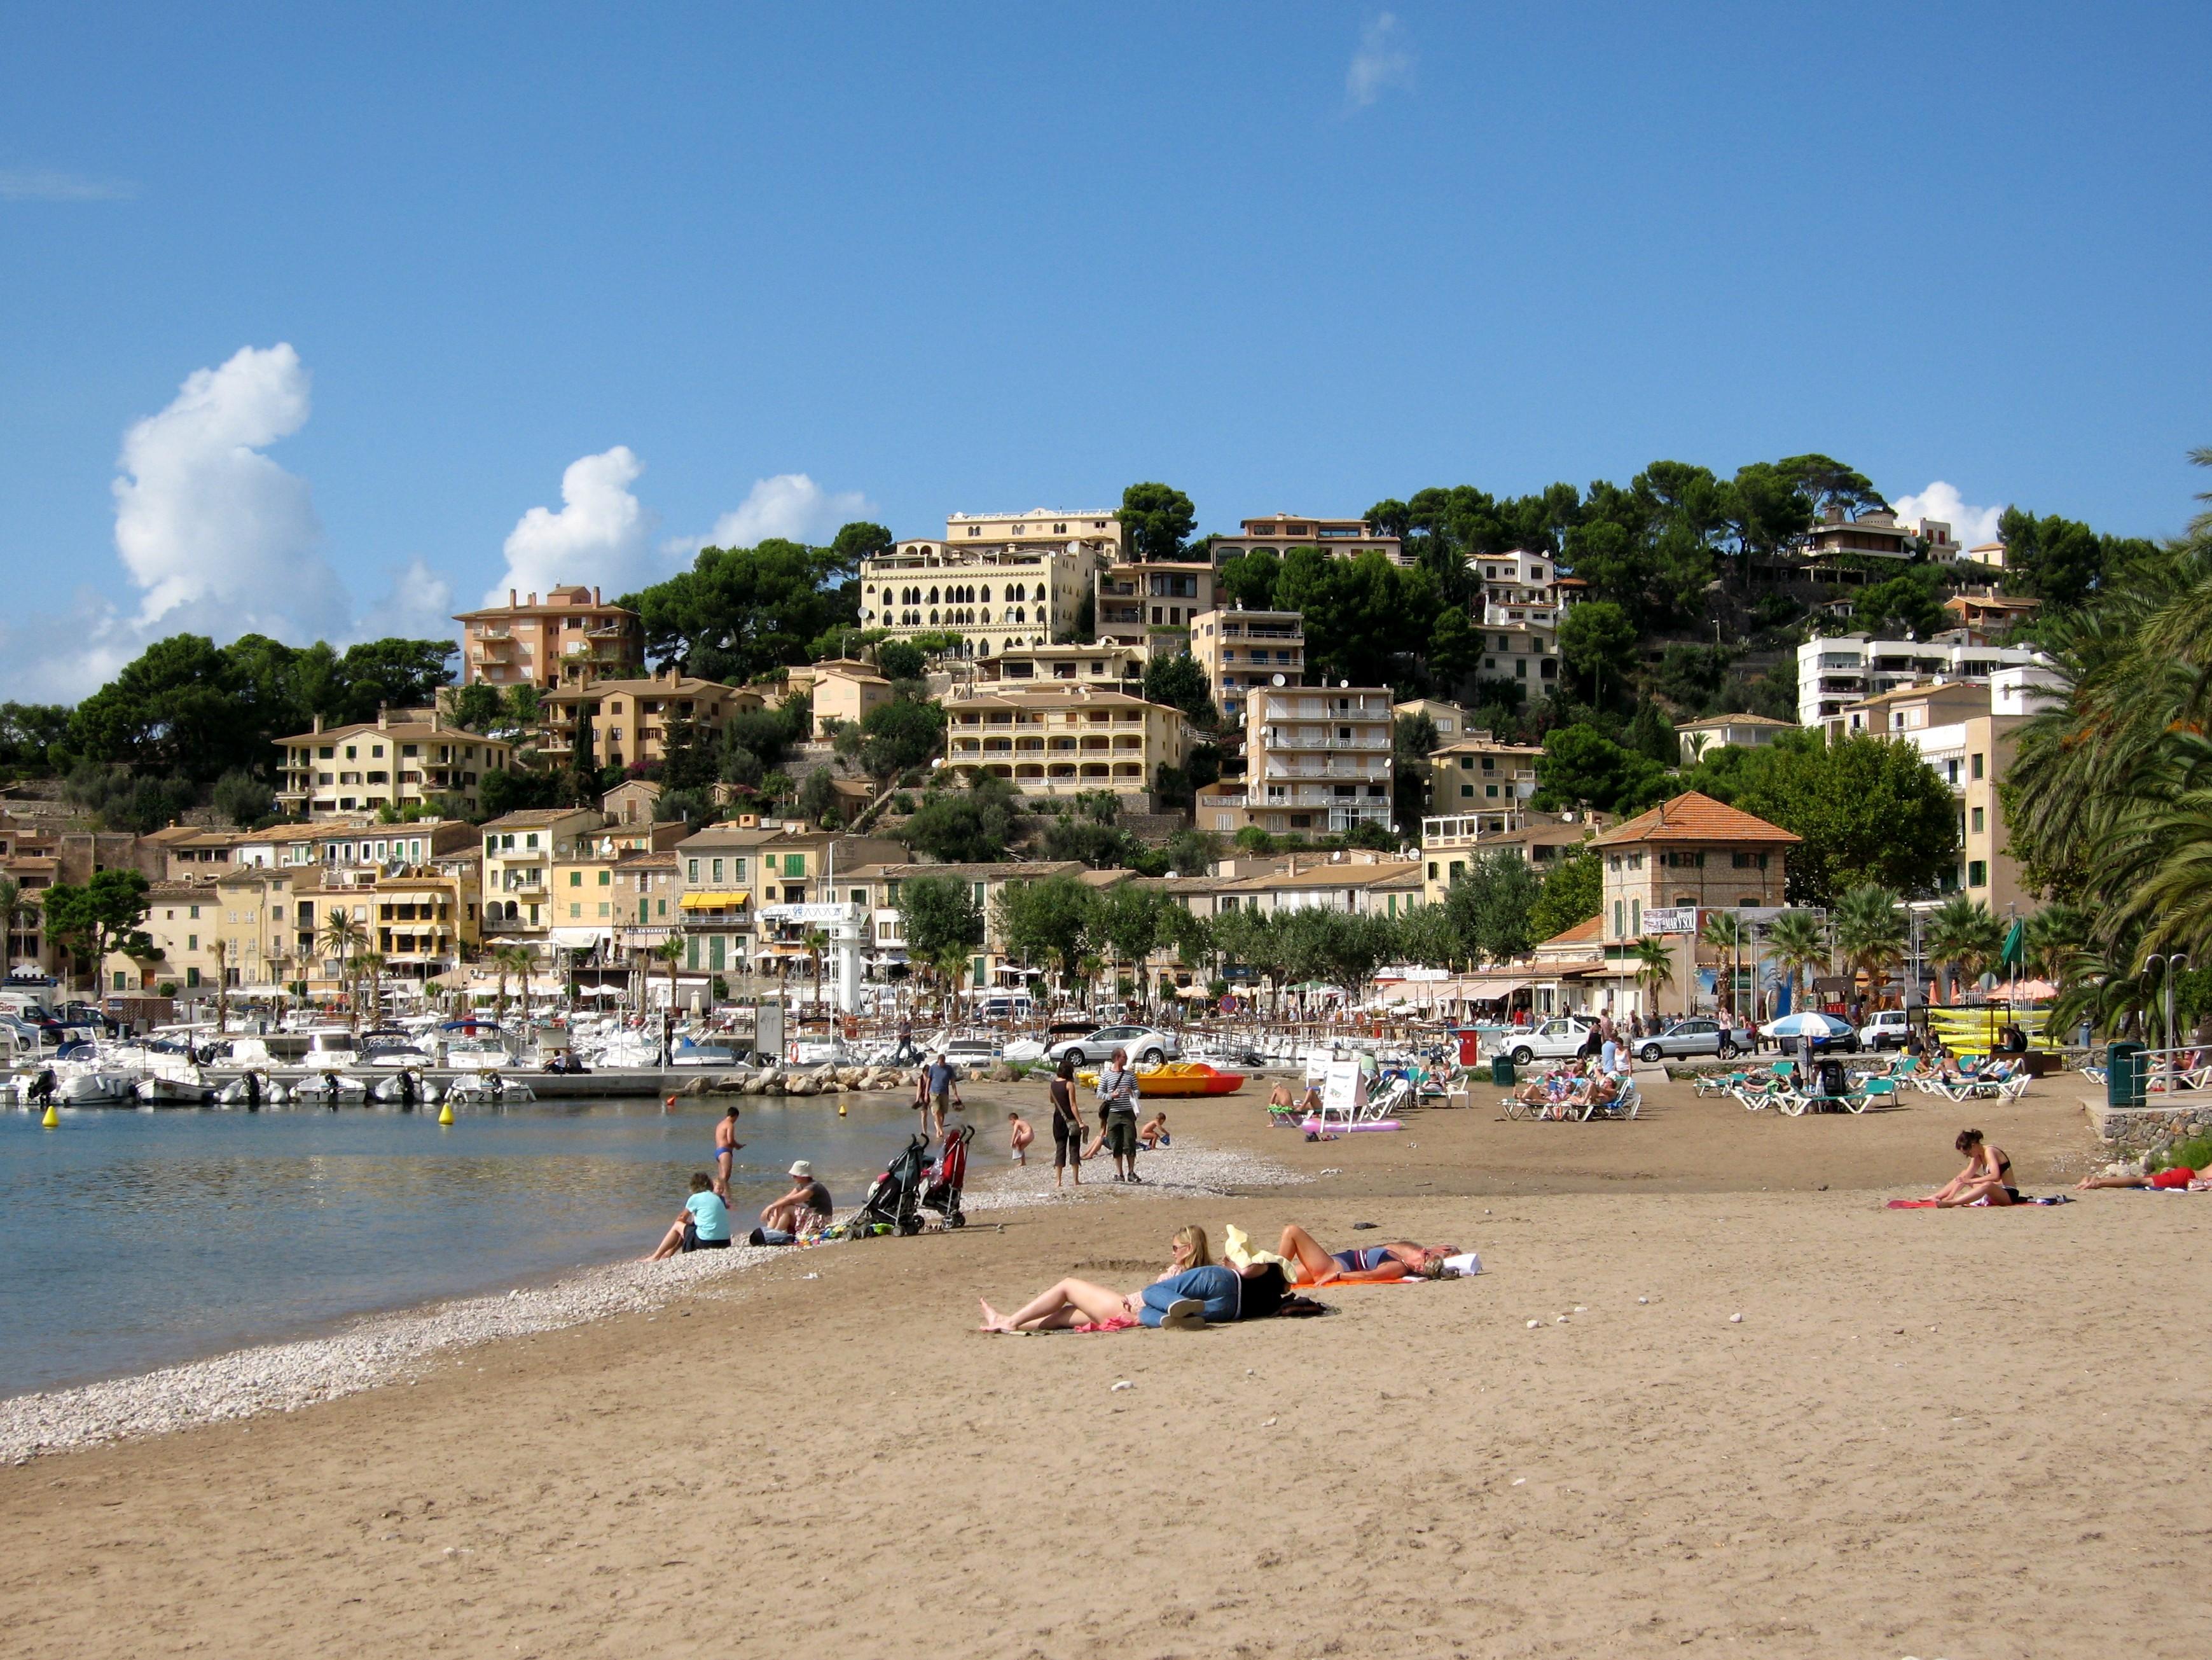 Hotel Port Catalonia